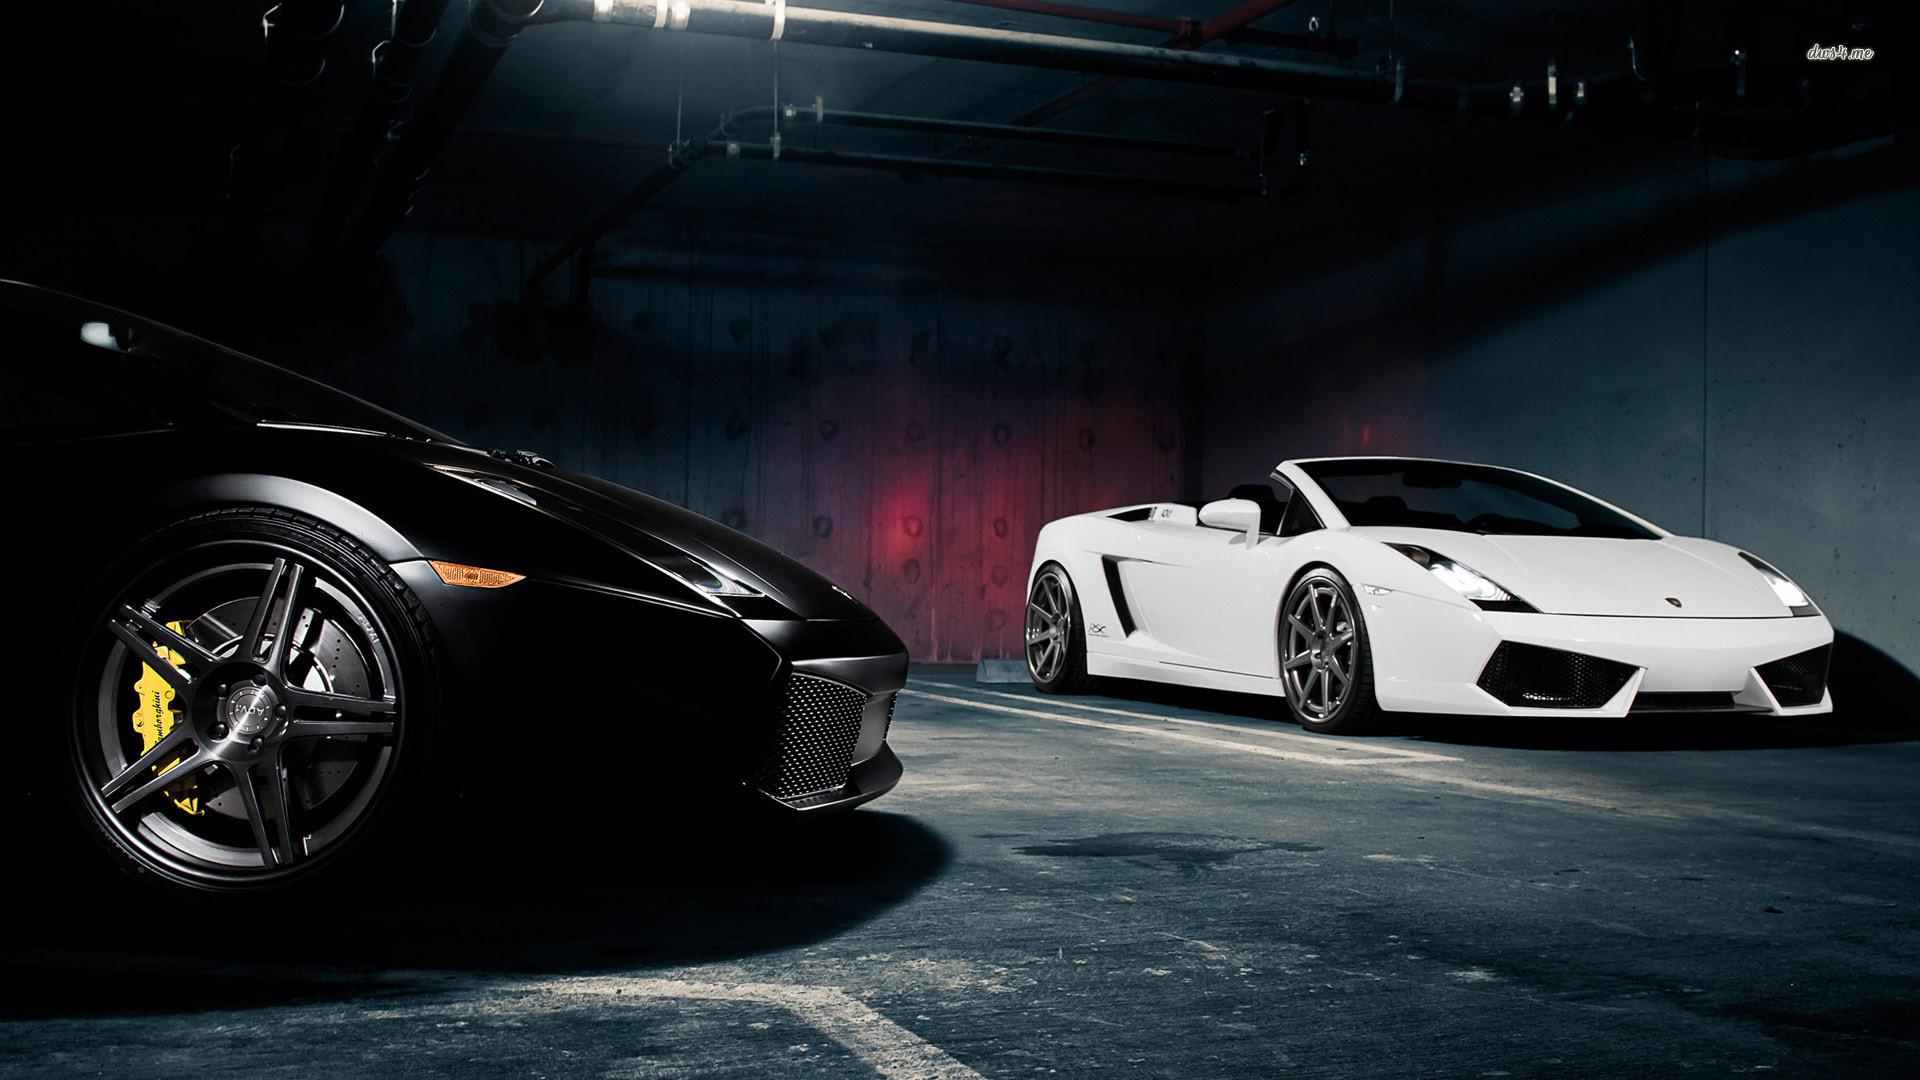 Lamborghini Sports Cars Black and White HD Wallpaper HD Wallpaper of